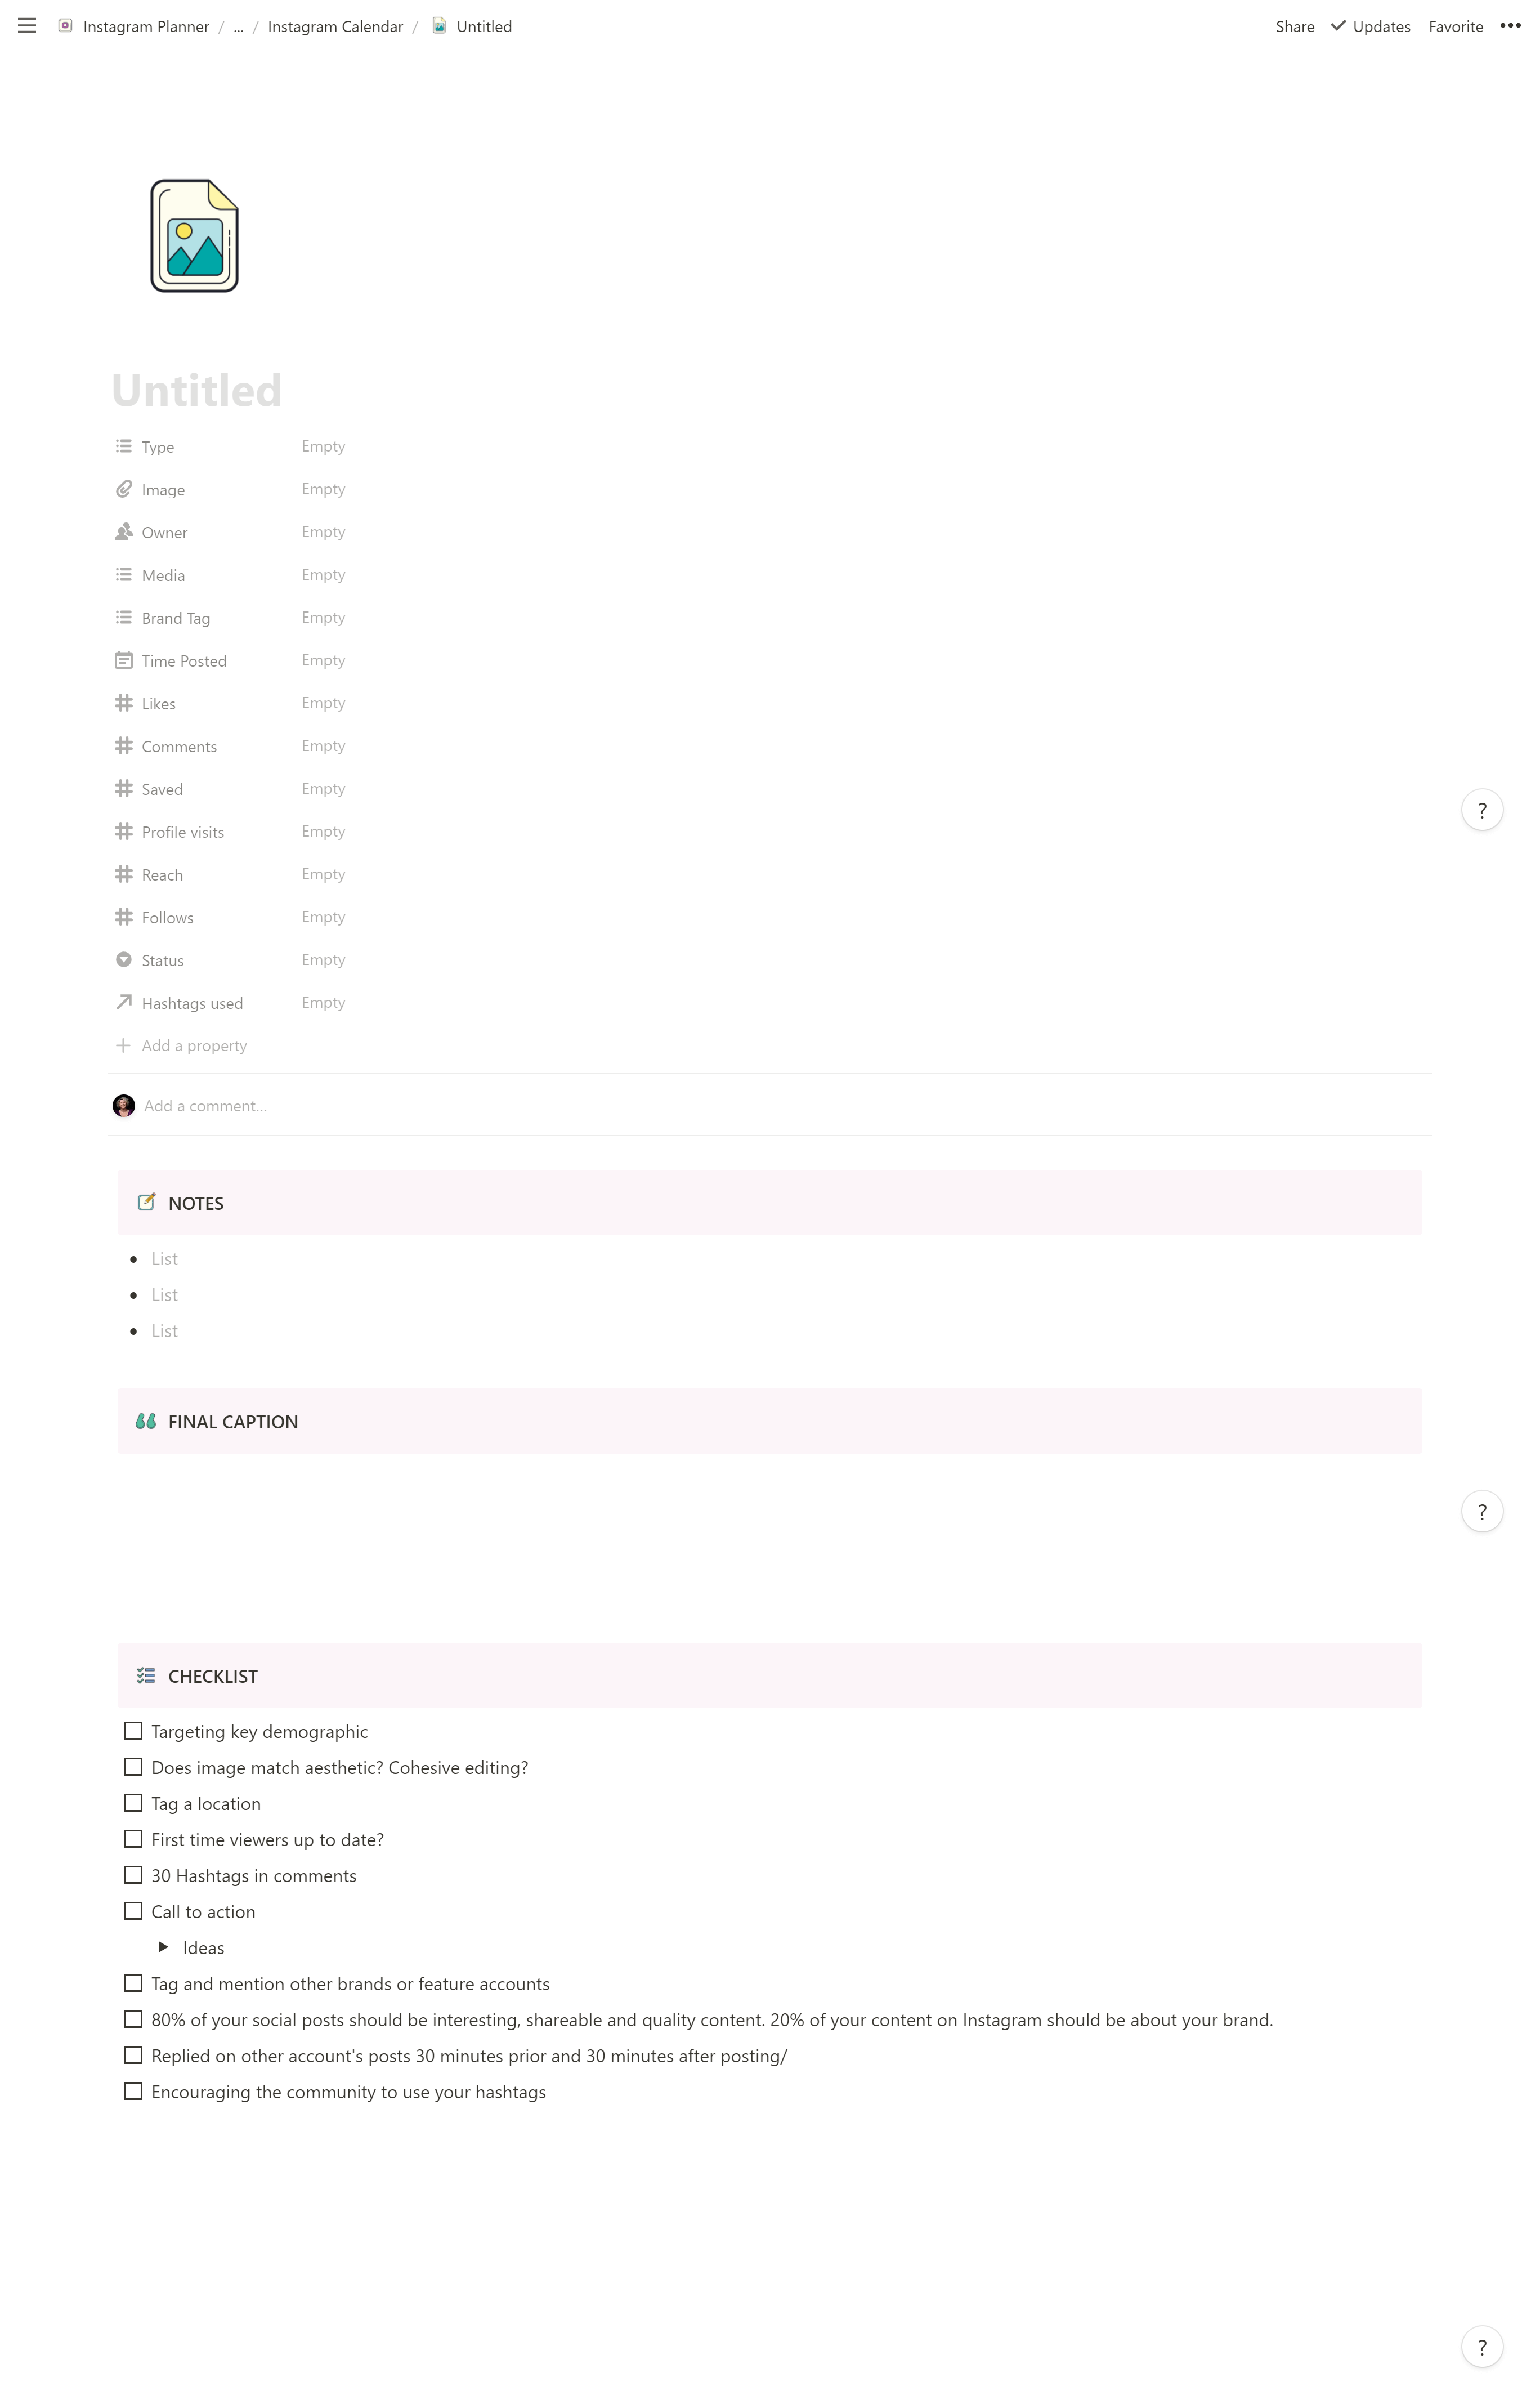 Instagram Planner and Calendar